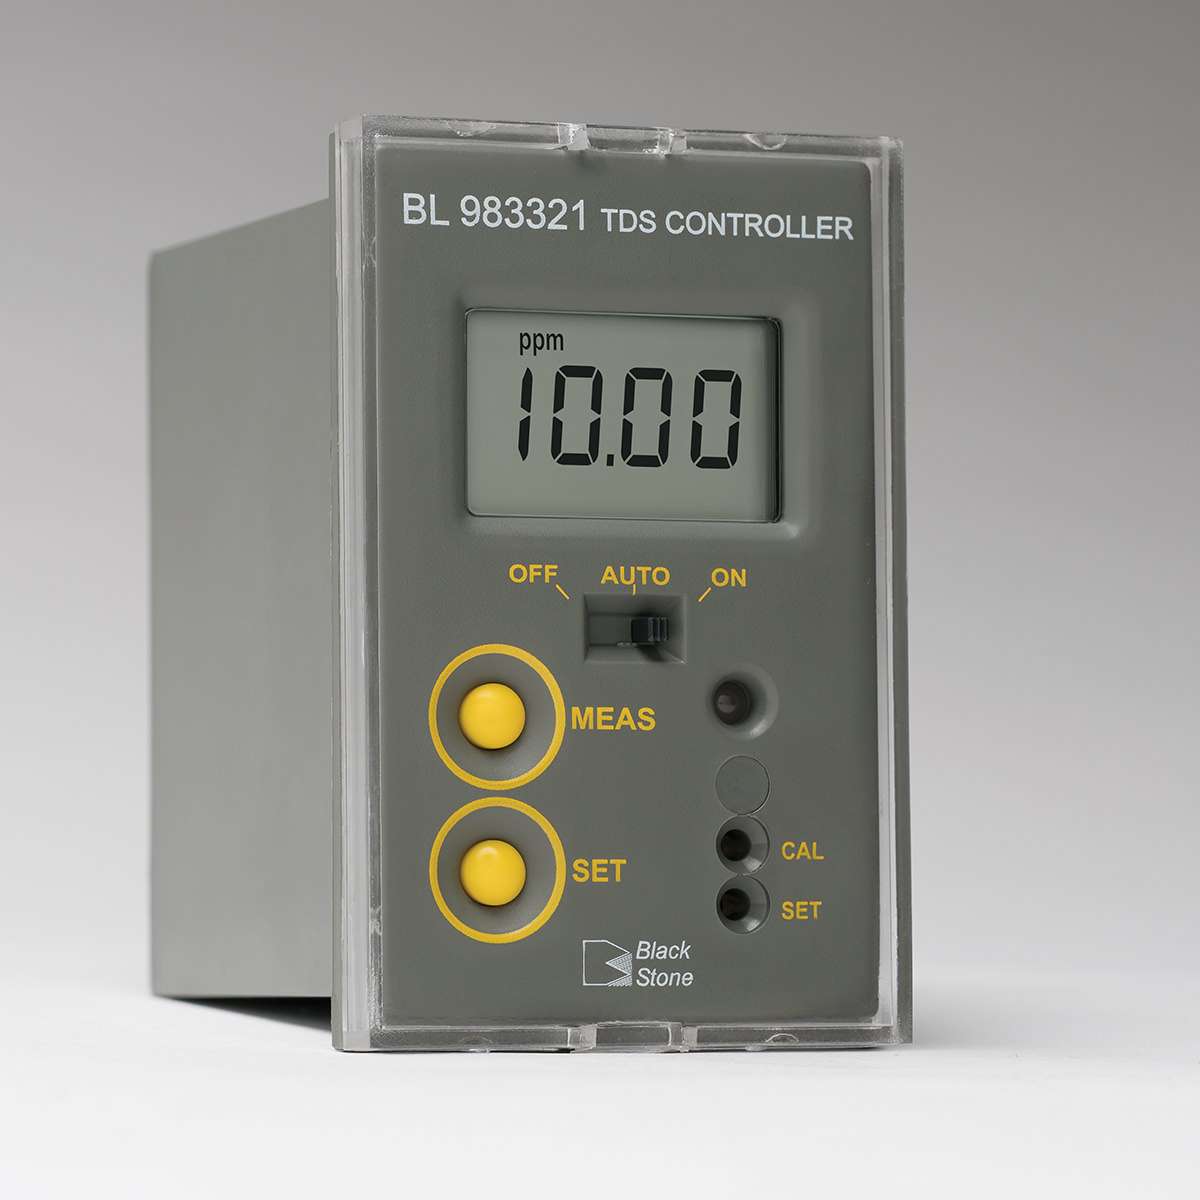 tds-mini-controller-bl983321-angle